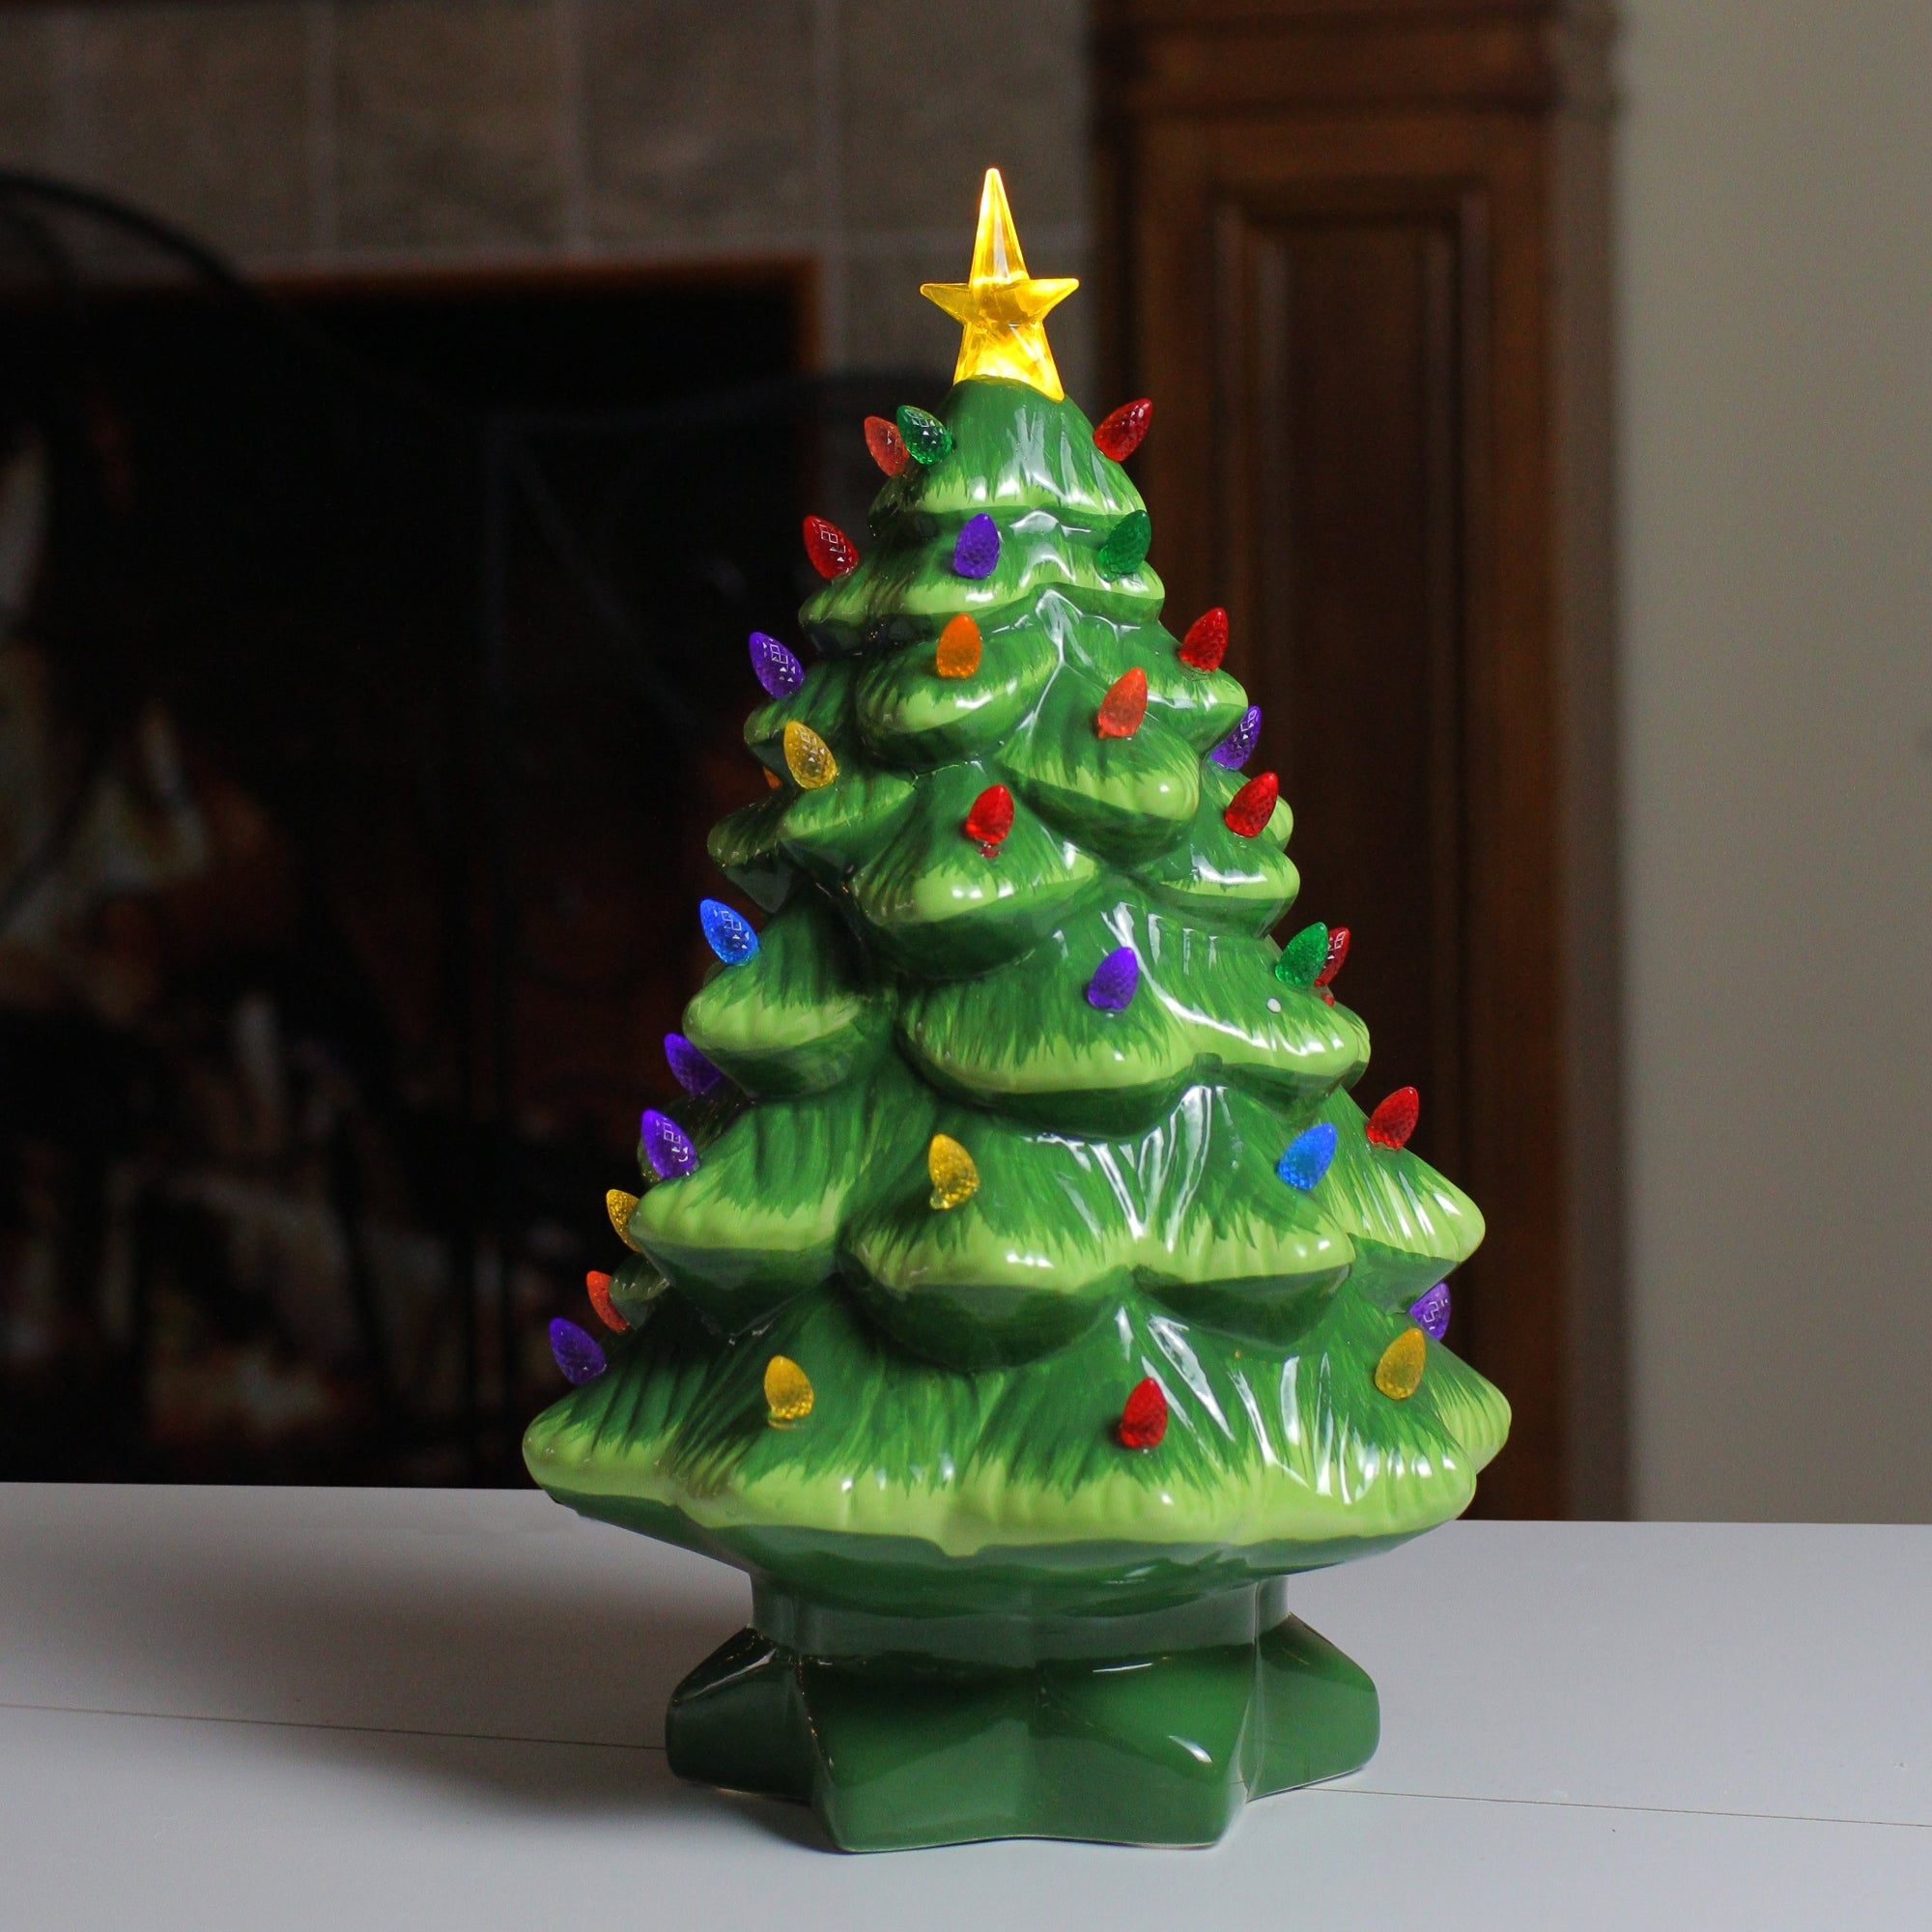 Mr Christmas Multi Color Lighted Nostalgic Ceramic Tree 14 Green